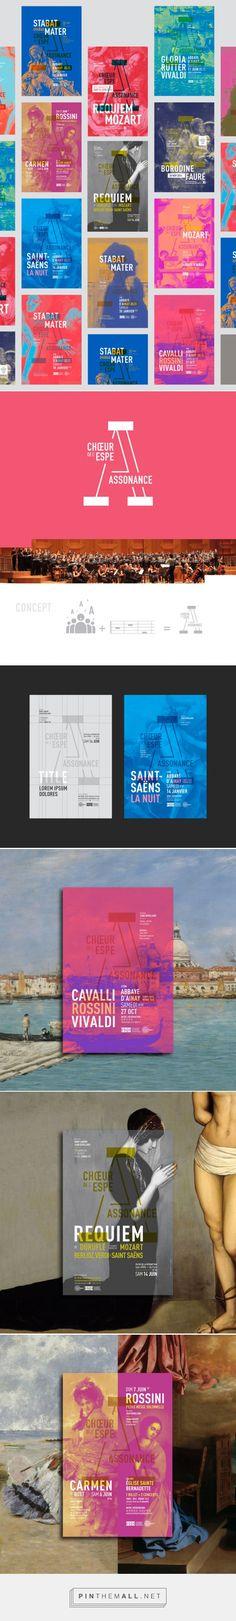 Assonance Choir Posters by Graphéine